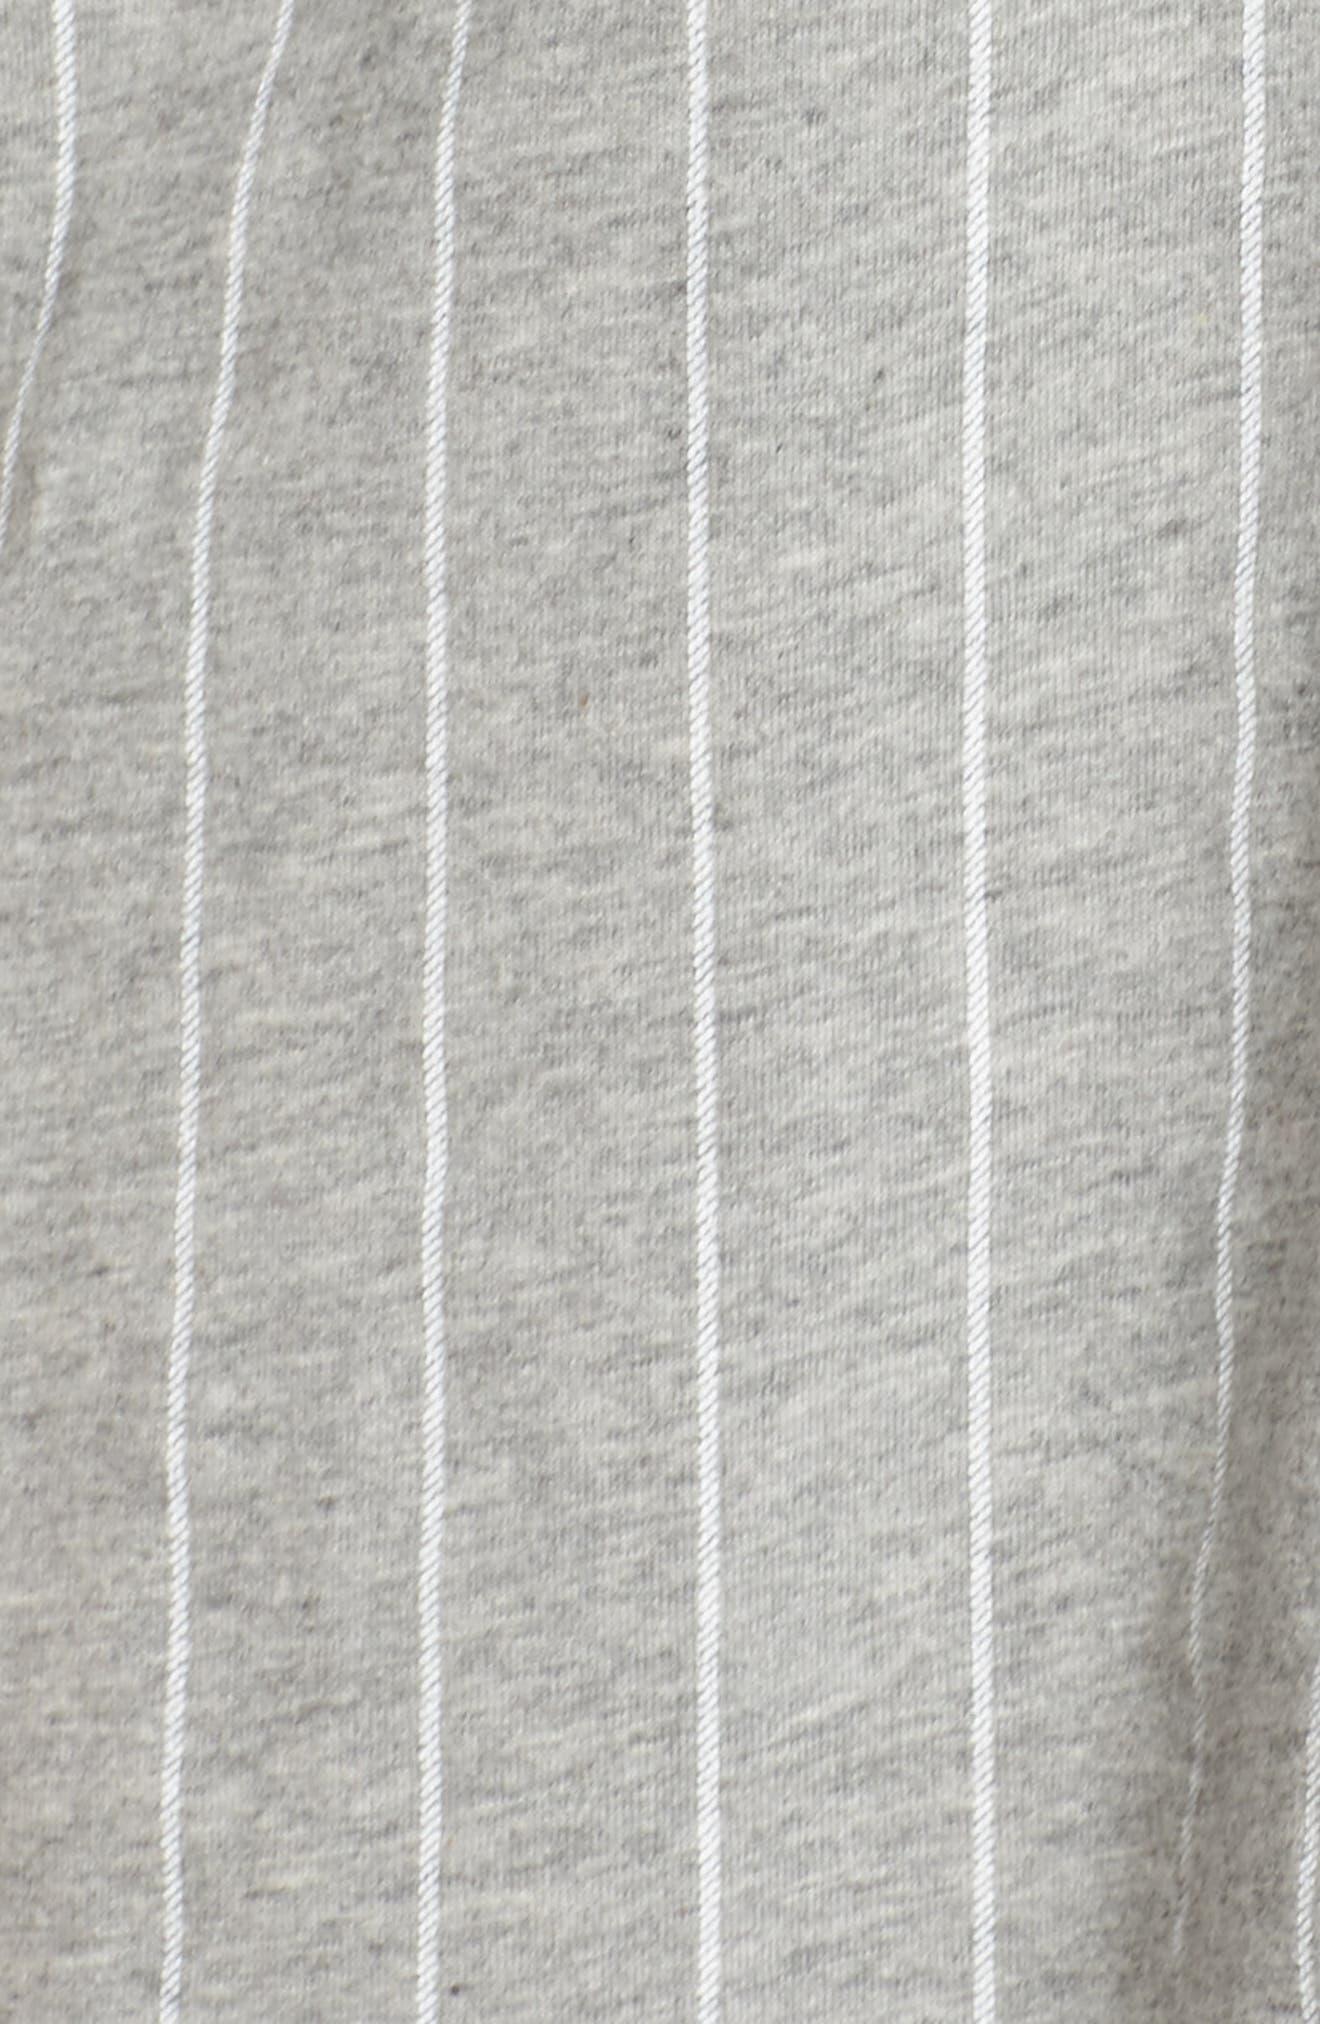 LAUREN RALPH LAUREN,                             Jersey Sleep Shirt,                             Alternate thumbnail 5, color,                             GREYSTONE